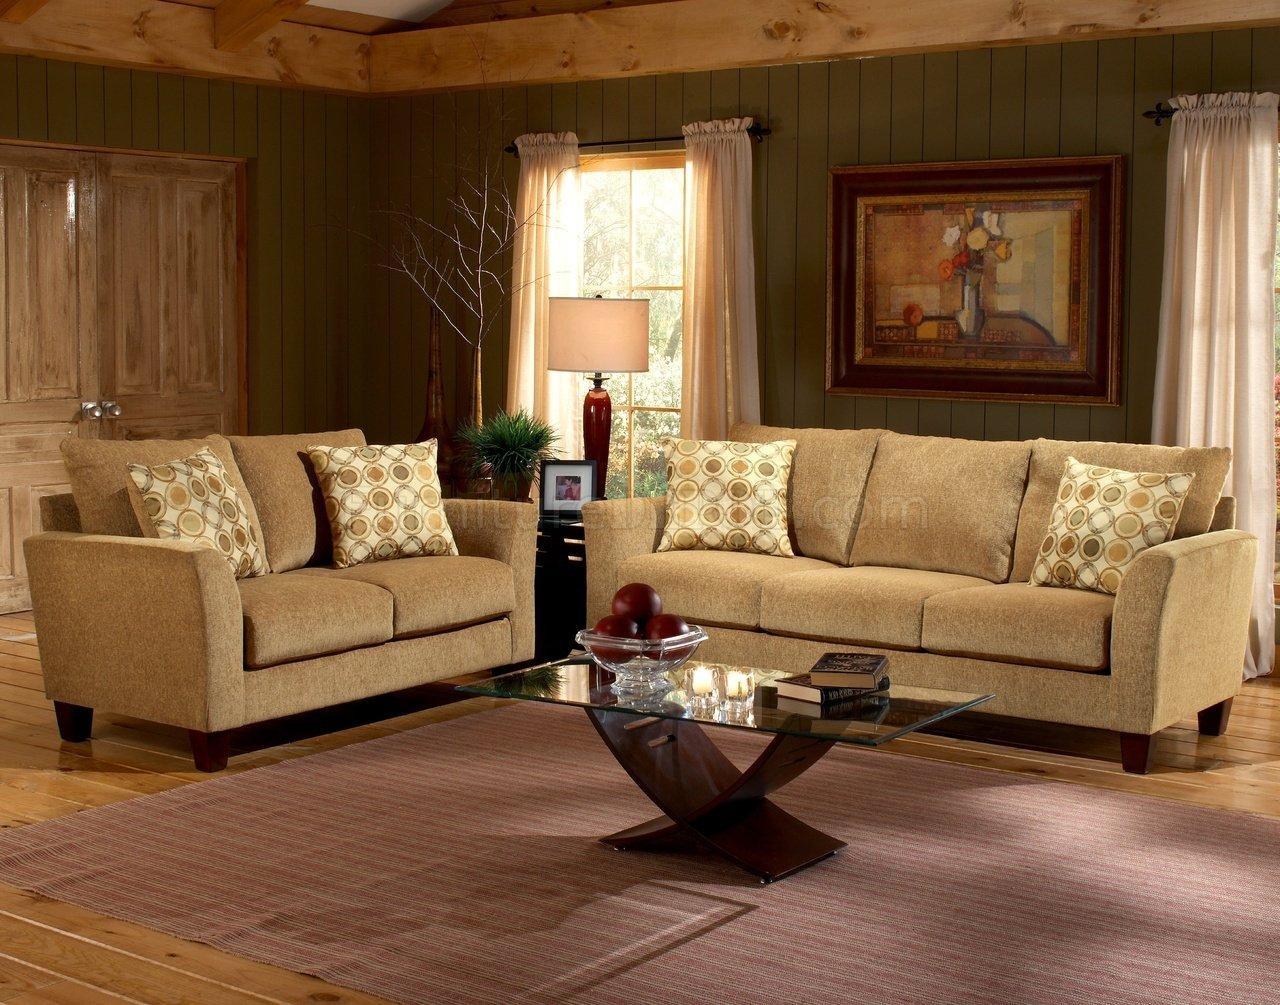 Camel Color Living Room Furniture – Carameloffers Inside Camel Color Sofas (View 10 of 20)